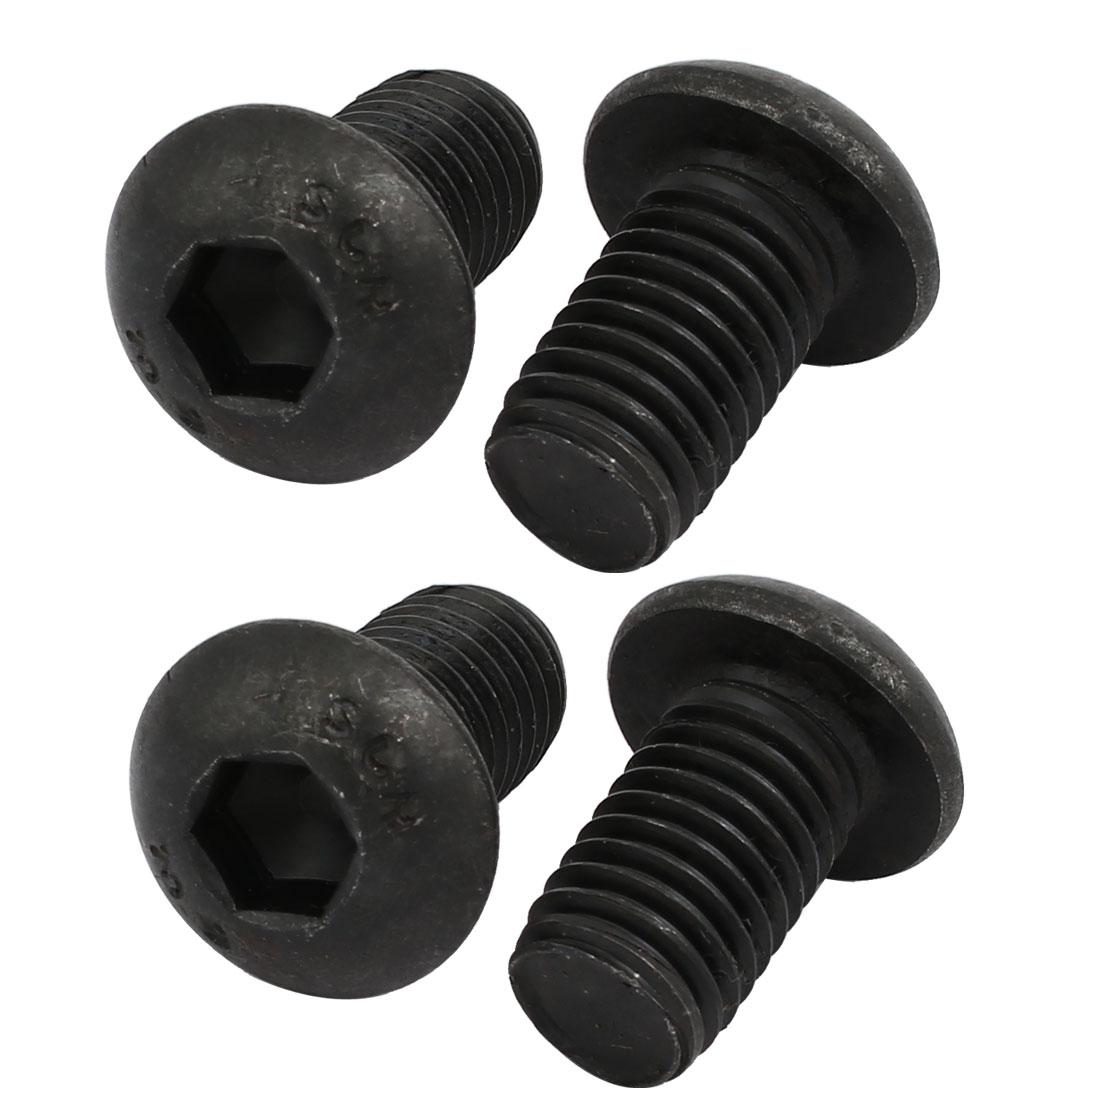 4pcs M12x20mm 10.9 Grade Button Head Hex Socket Left Hand Thread Screw Bolt